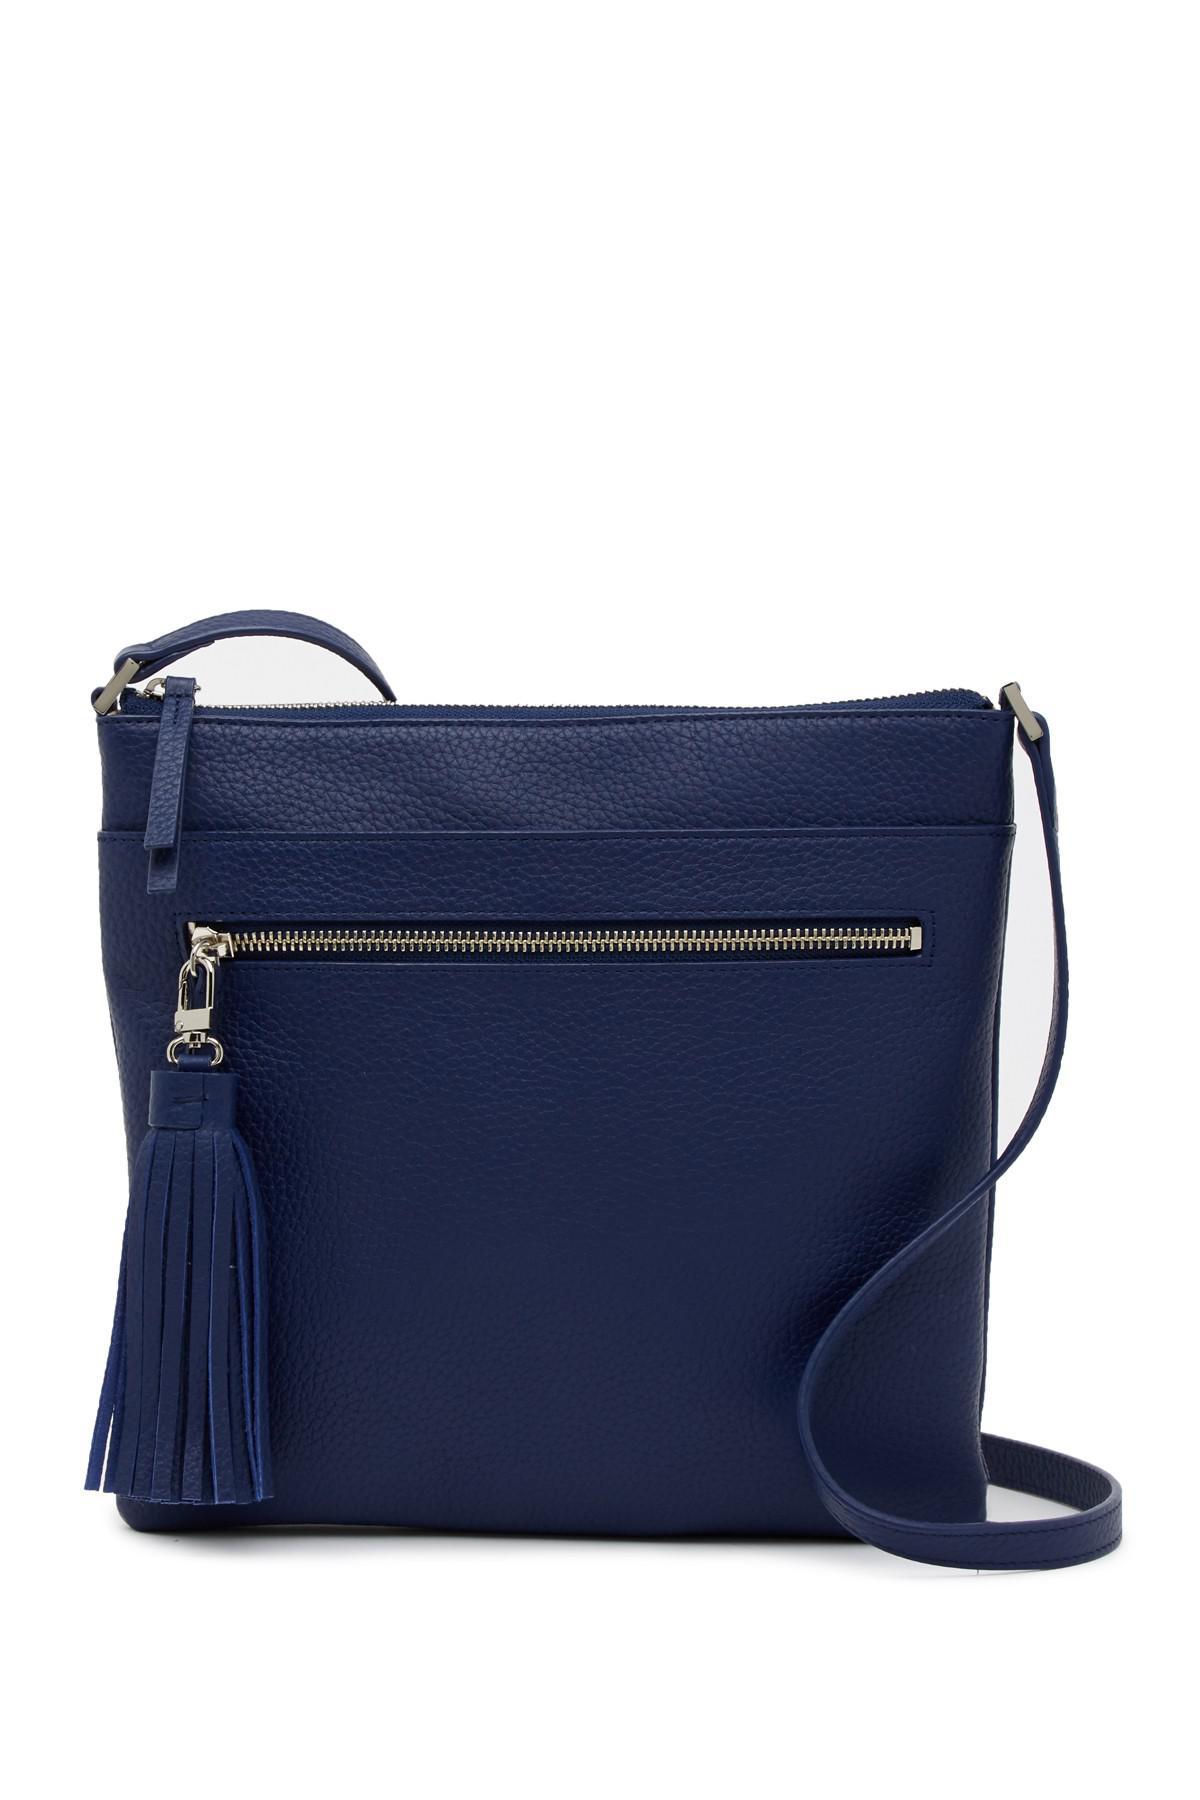 8b912e2cf9 Halogen (r) Tasseled Leather Crossbody Bag in Blue - Lyst